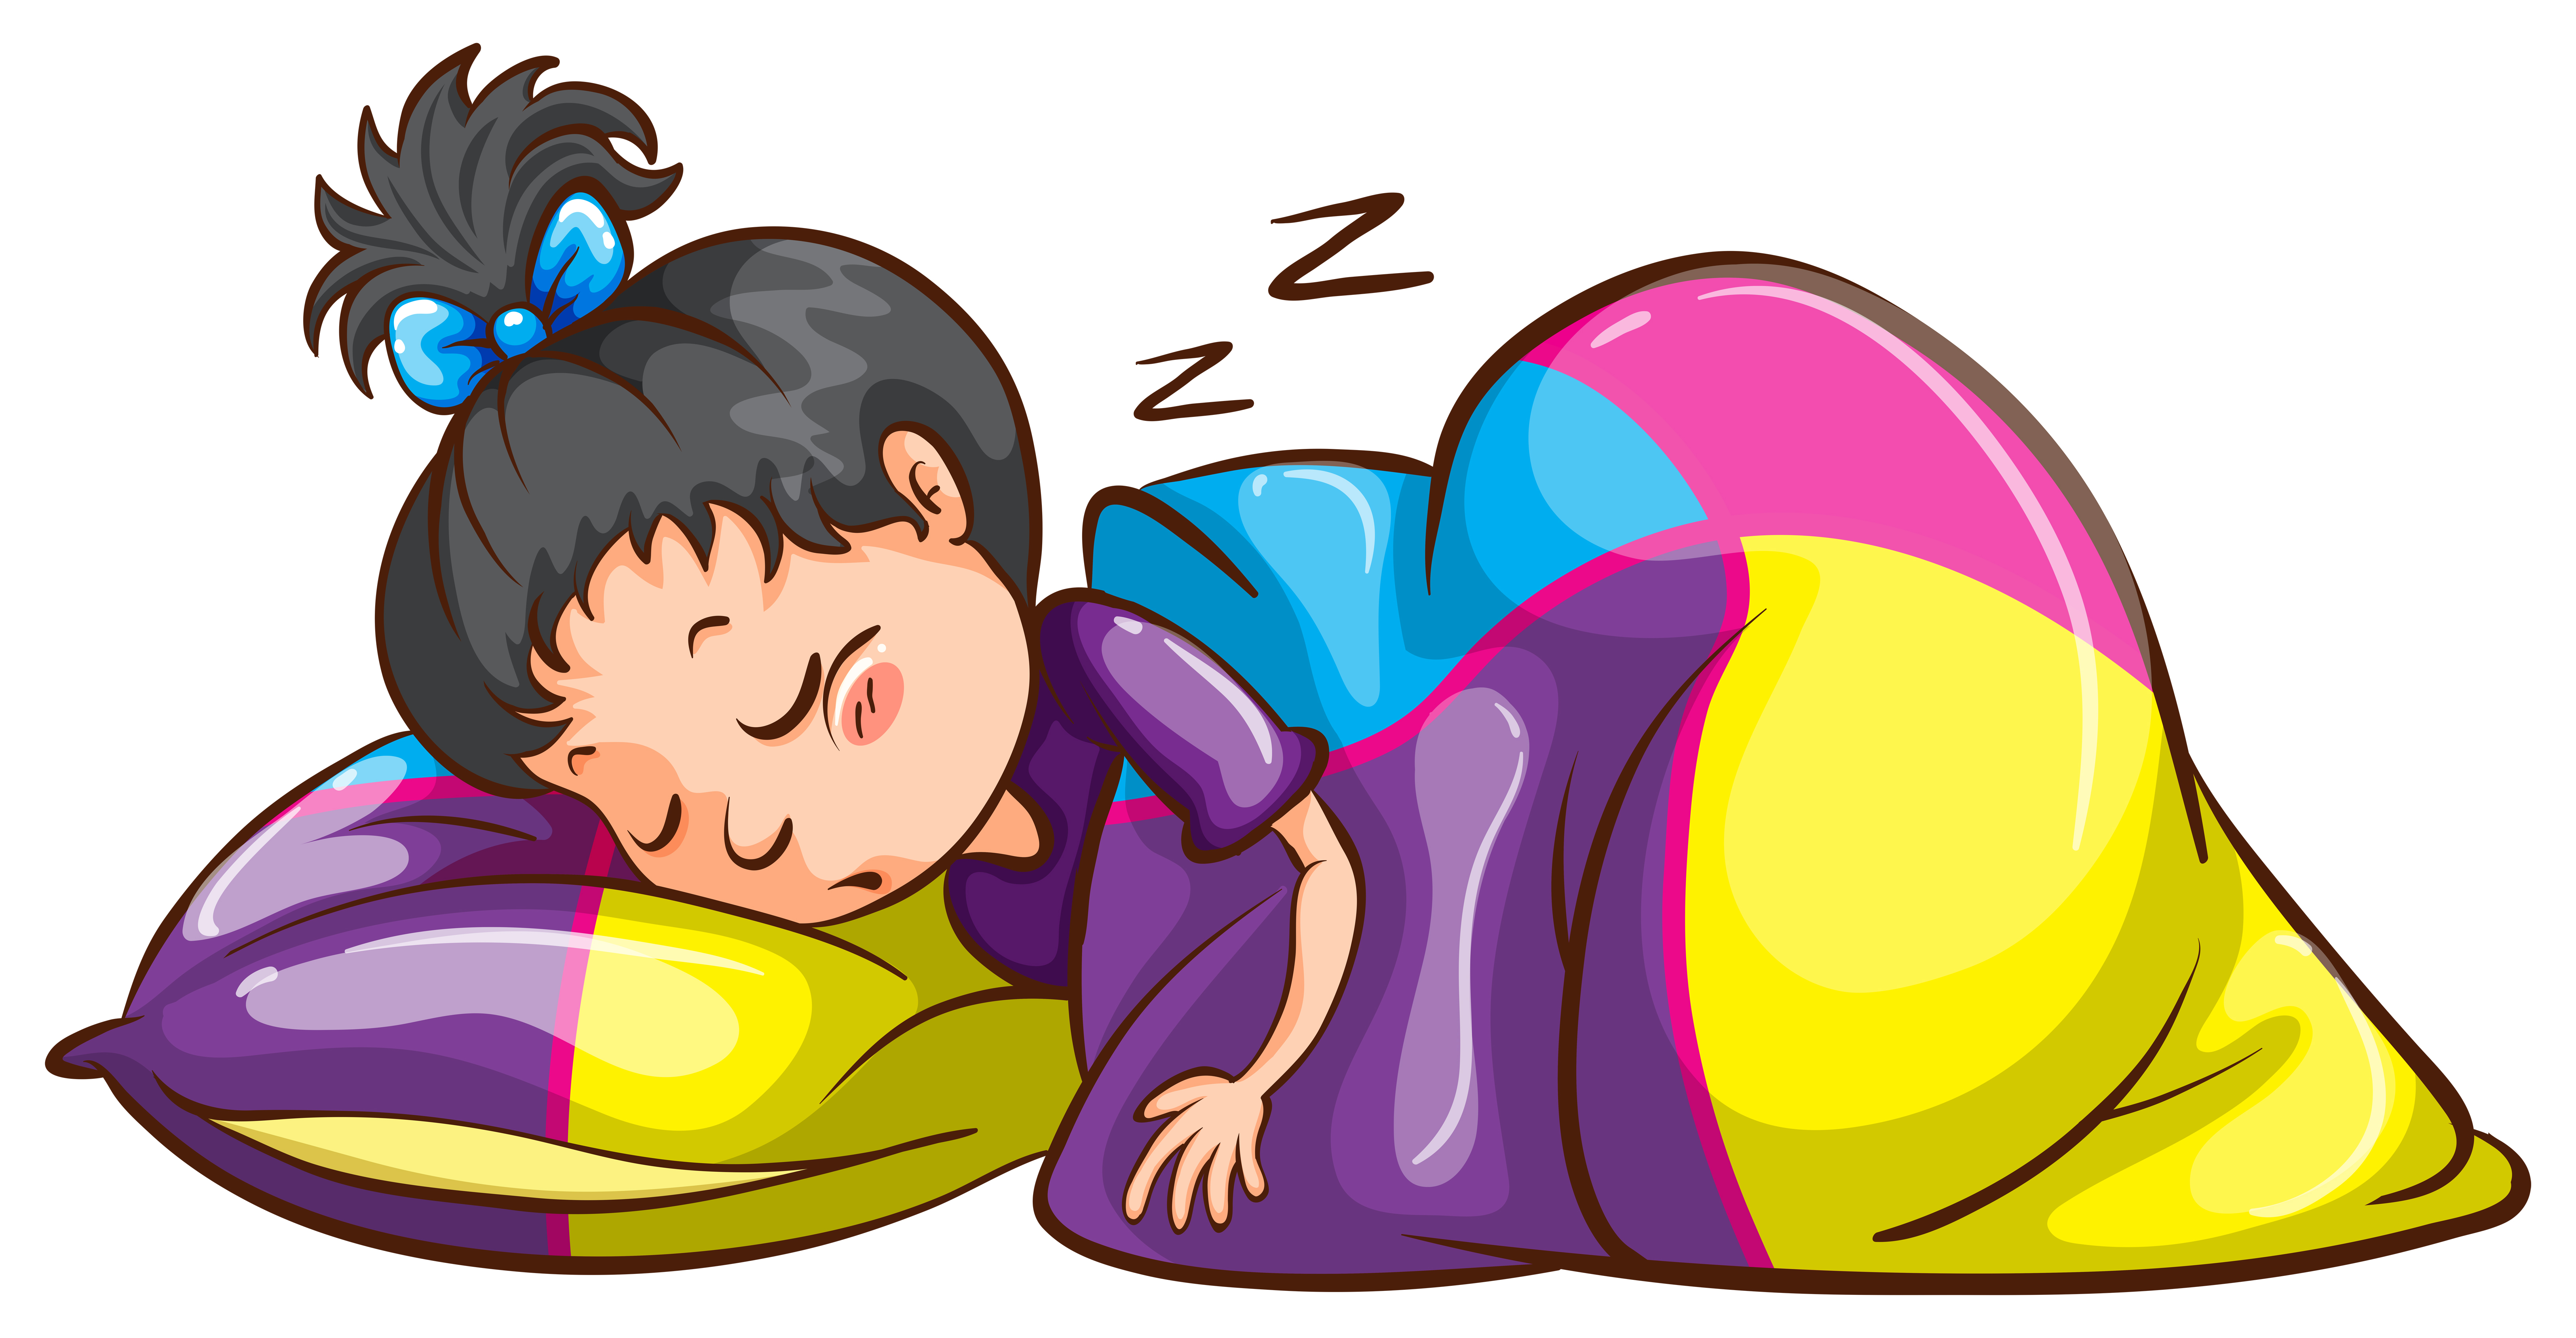 A Little Girl Sleeping Soundly